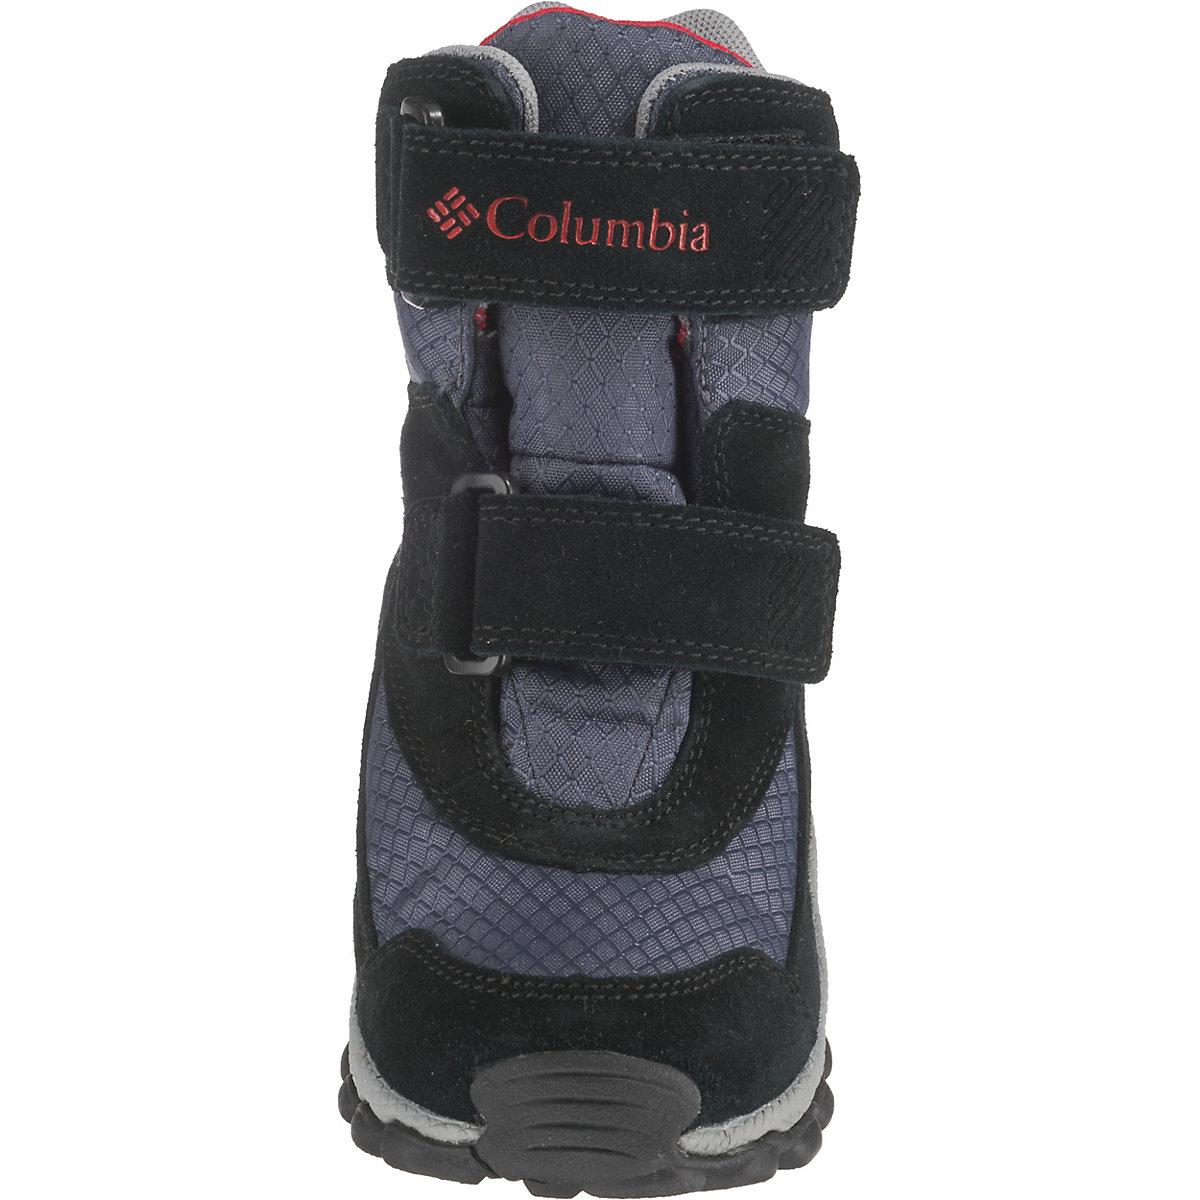 Columbia, Winterstiefel Parkers Peak™ Boot Für Jungen, Graphit